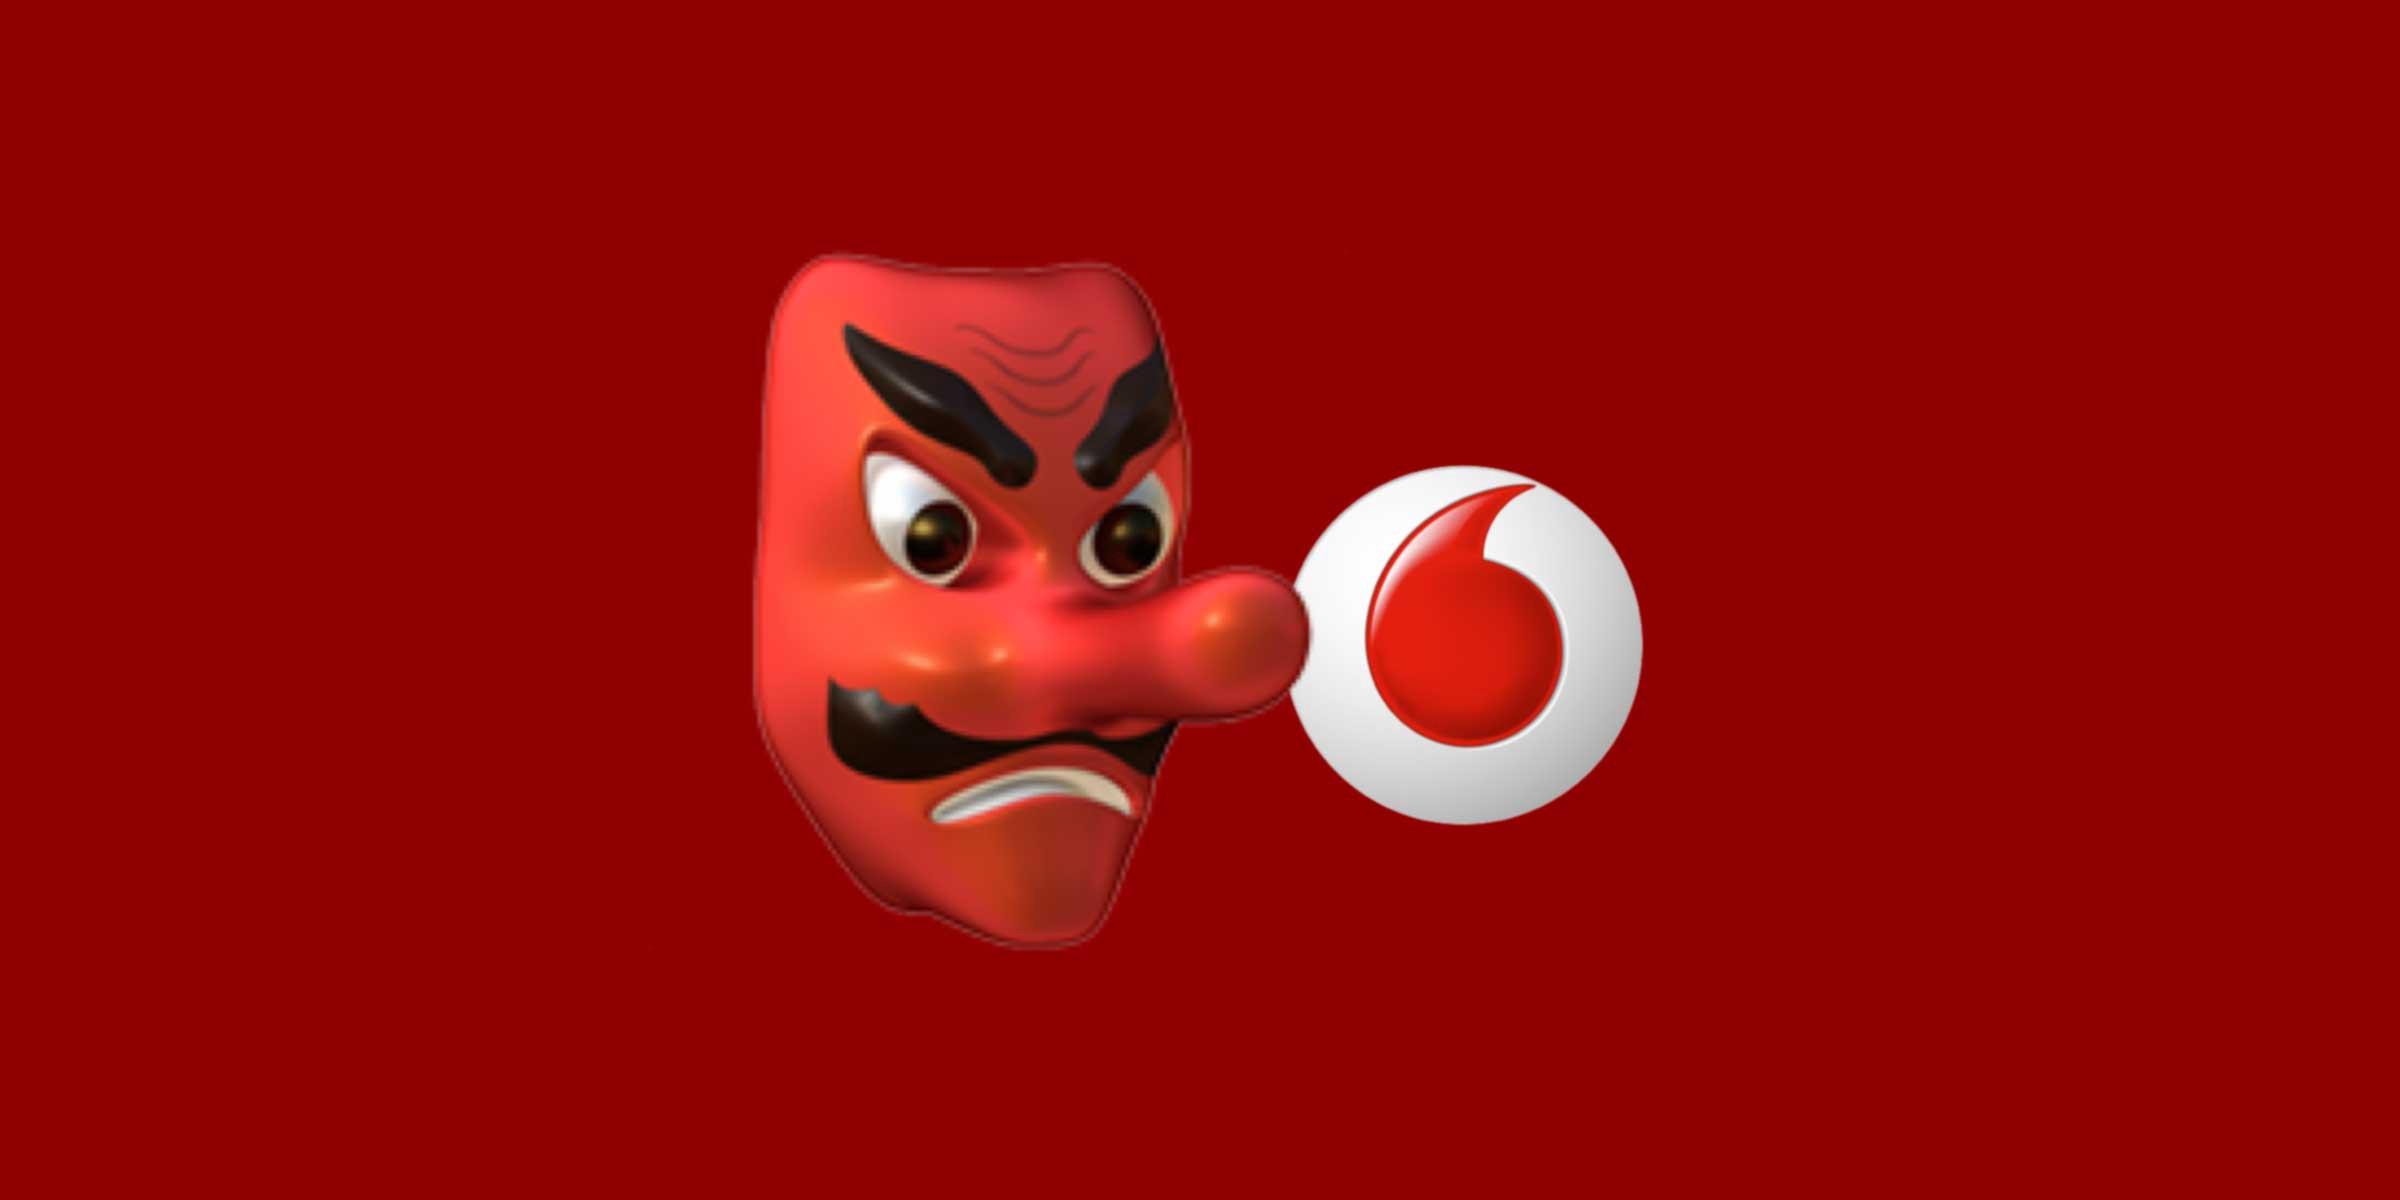 Dear Vodafone, please respect my privacy - By Frank Lämmer